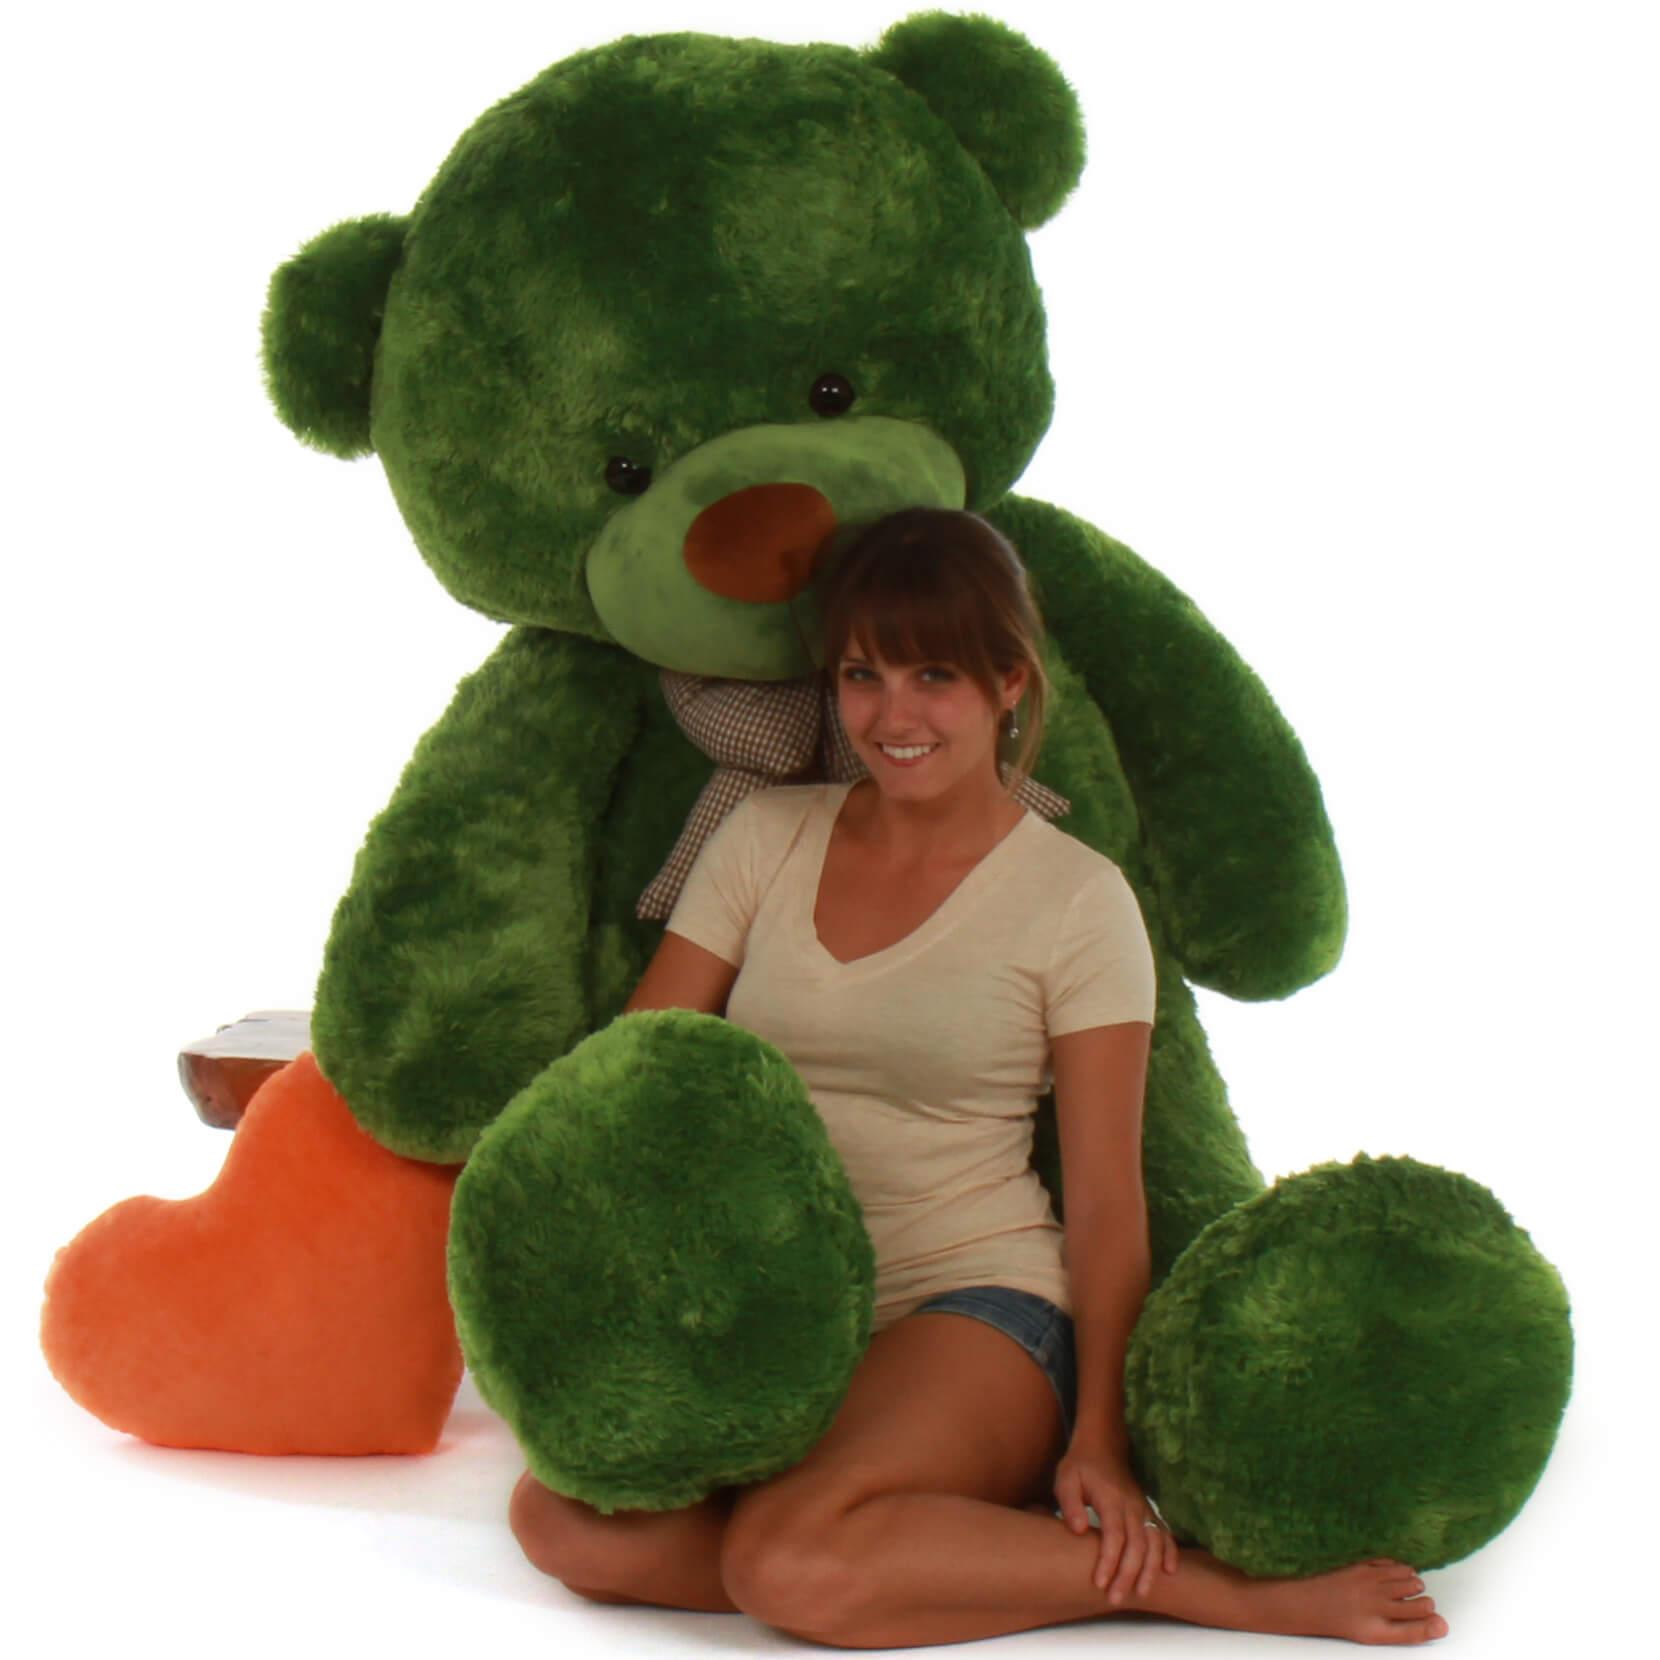 72in Life Size Green Teddy Bear Lucky Cuddles Giant Teddy